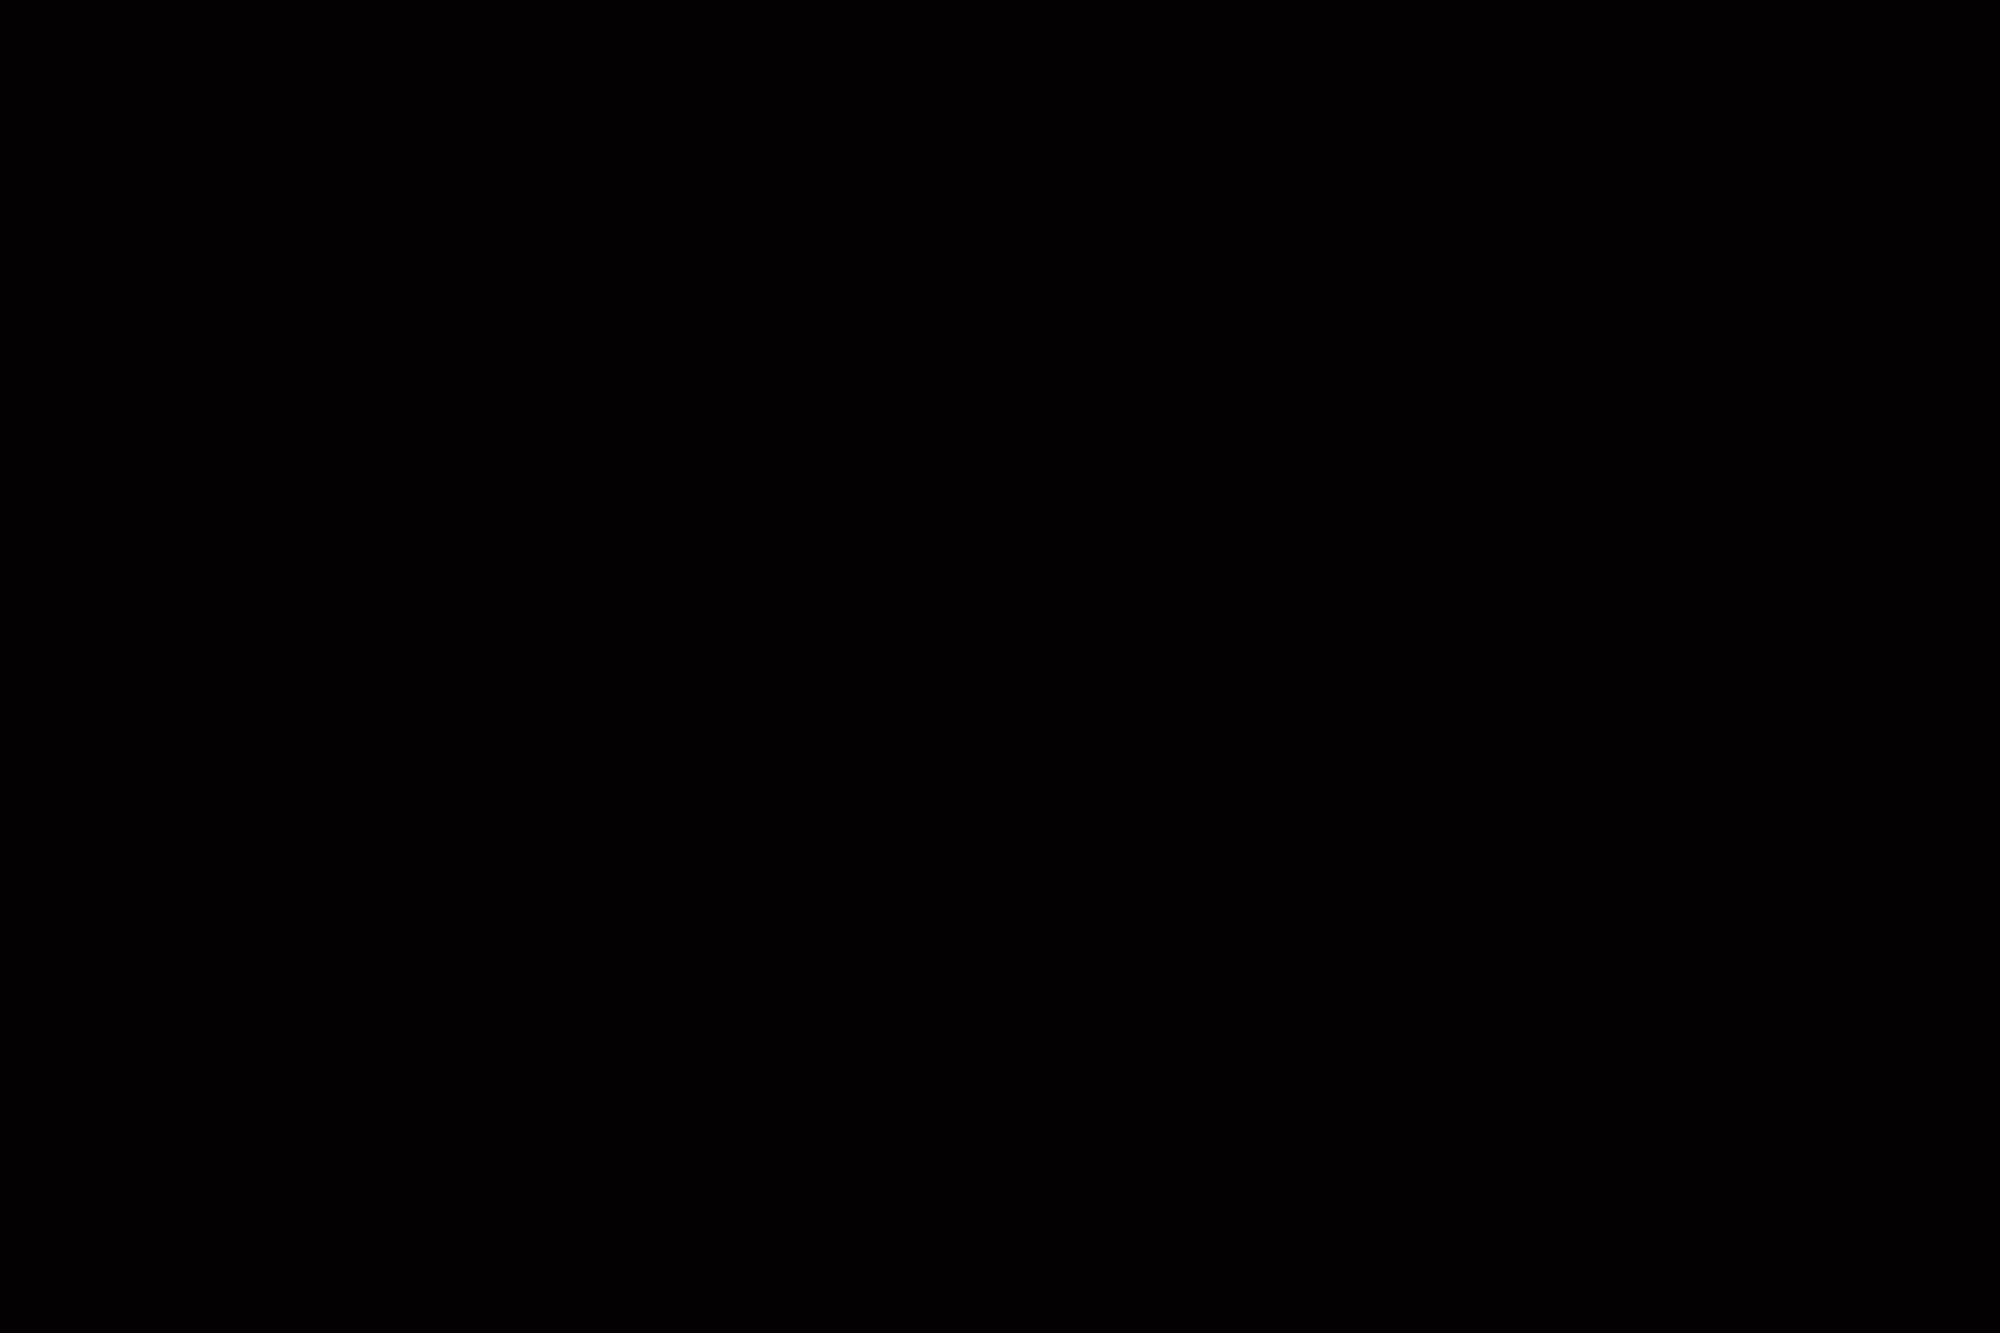 Akinehi Munroe performs The Wolves at Loft, Q Theatre, 2019.